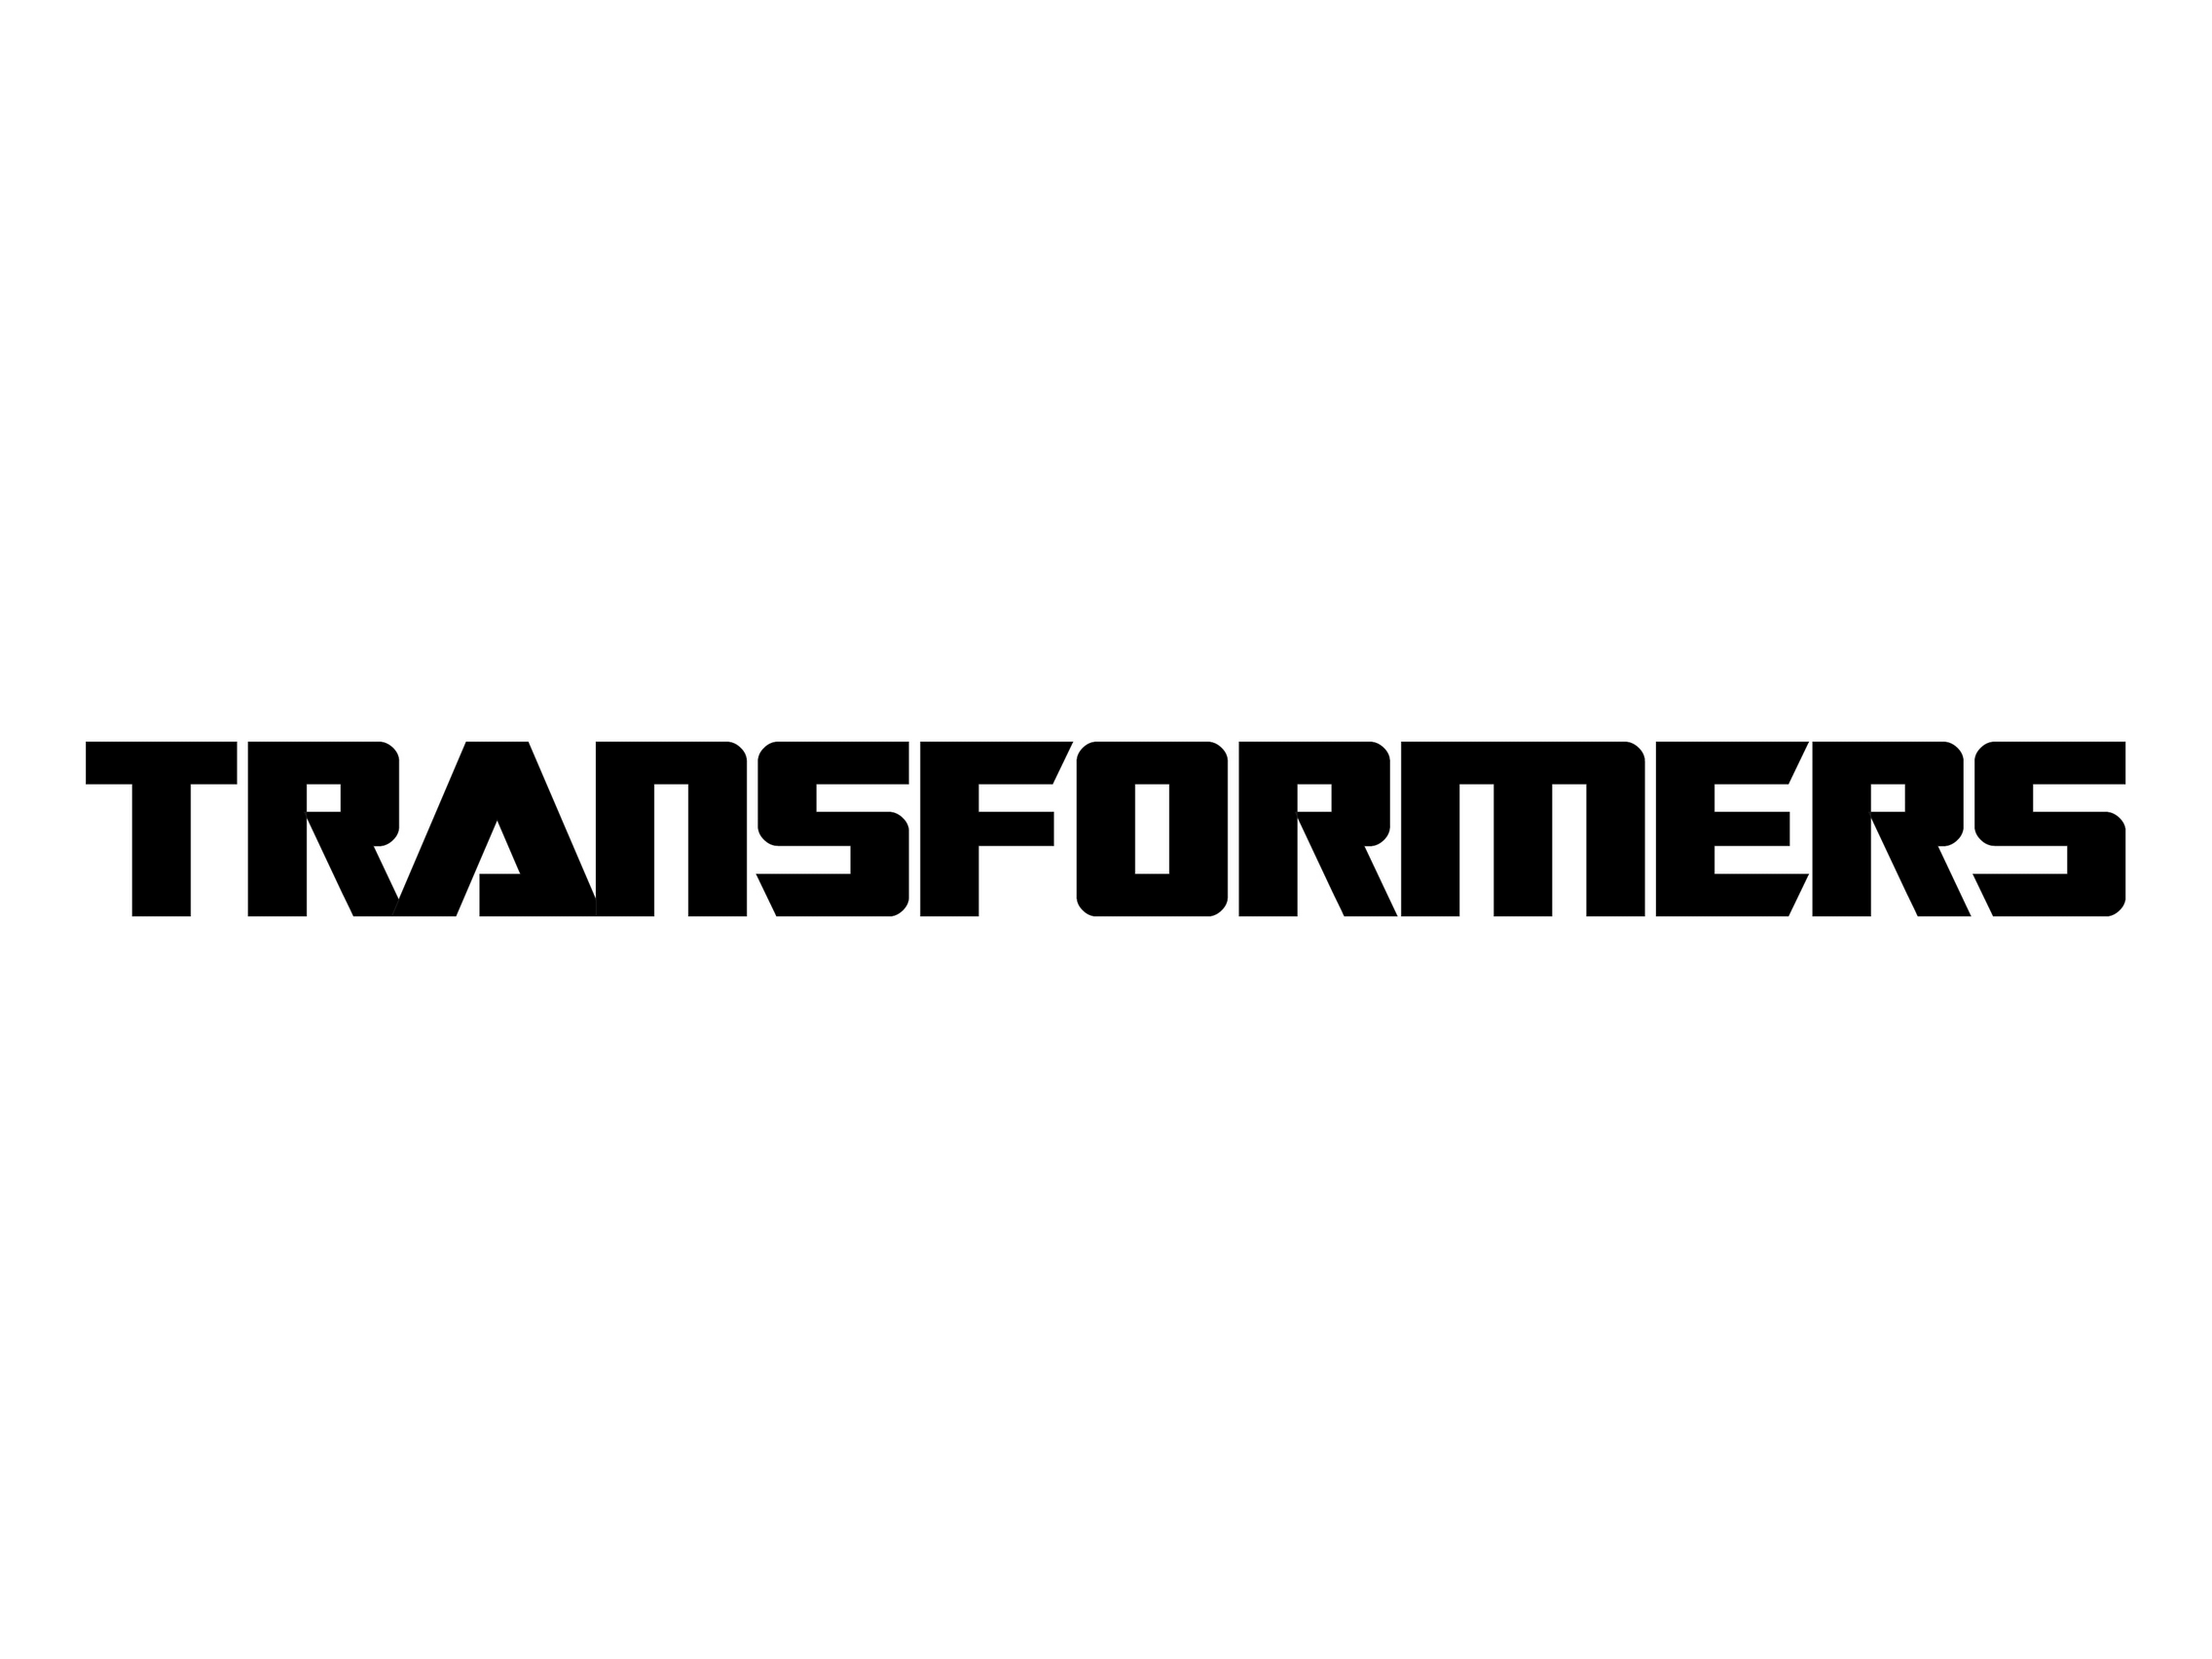 transformers logo text hd photo 19554 transparentpng